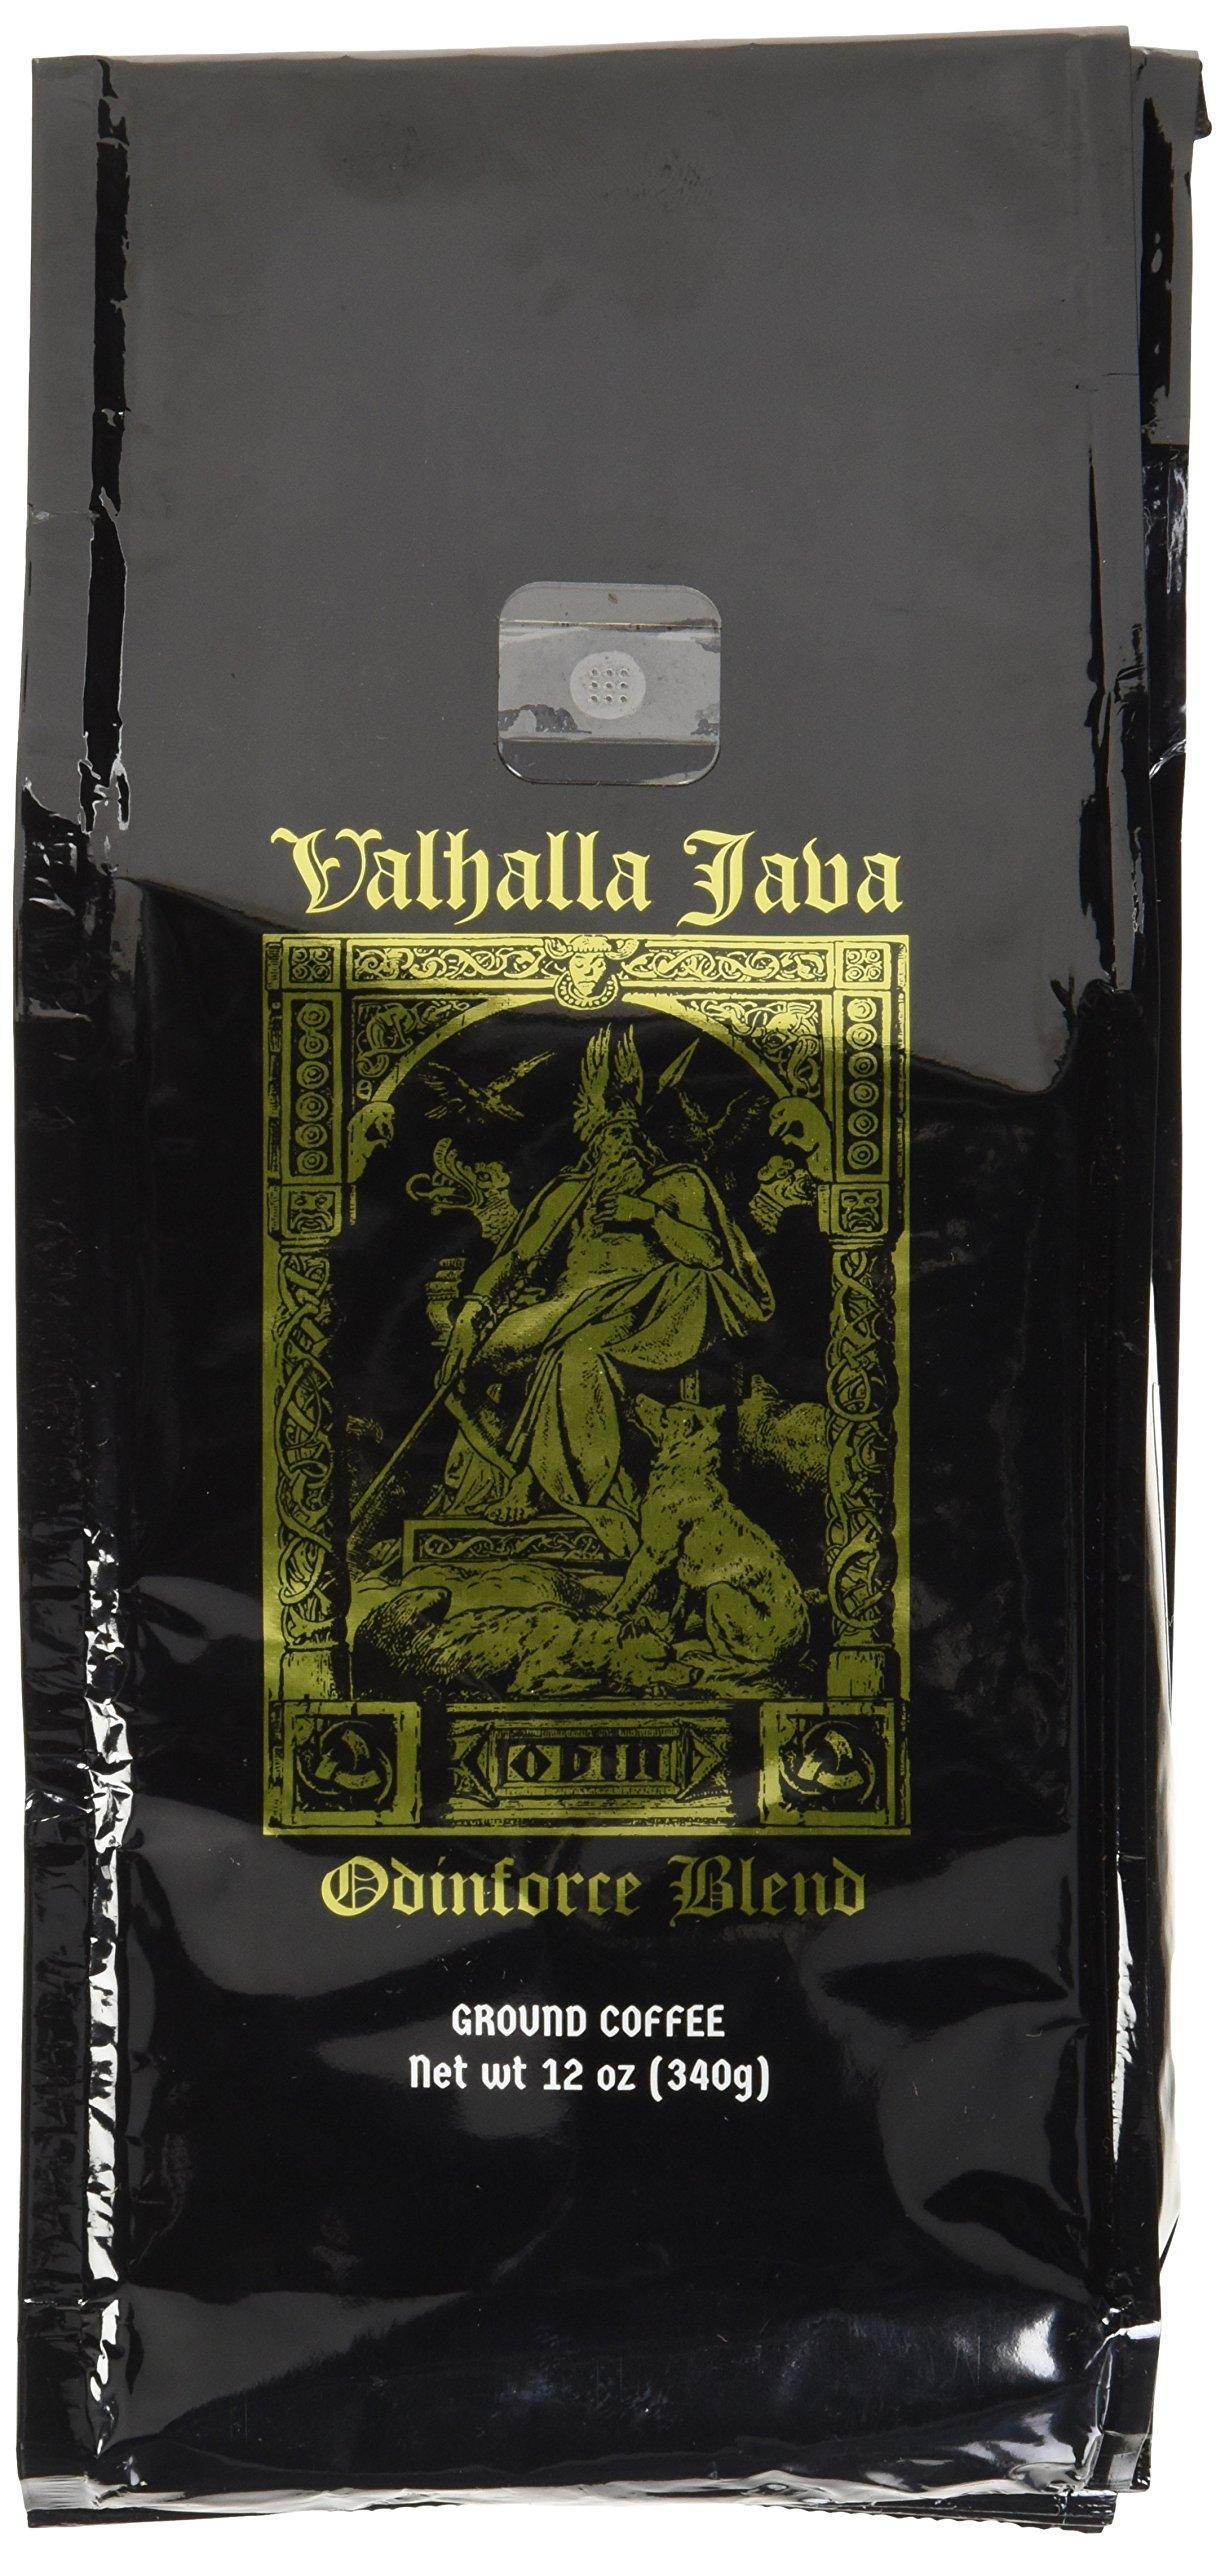 Valhalla Java